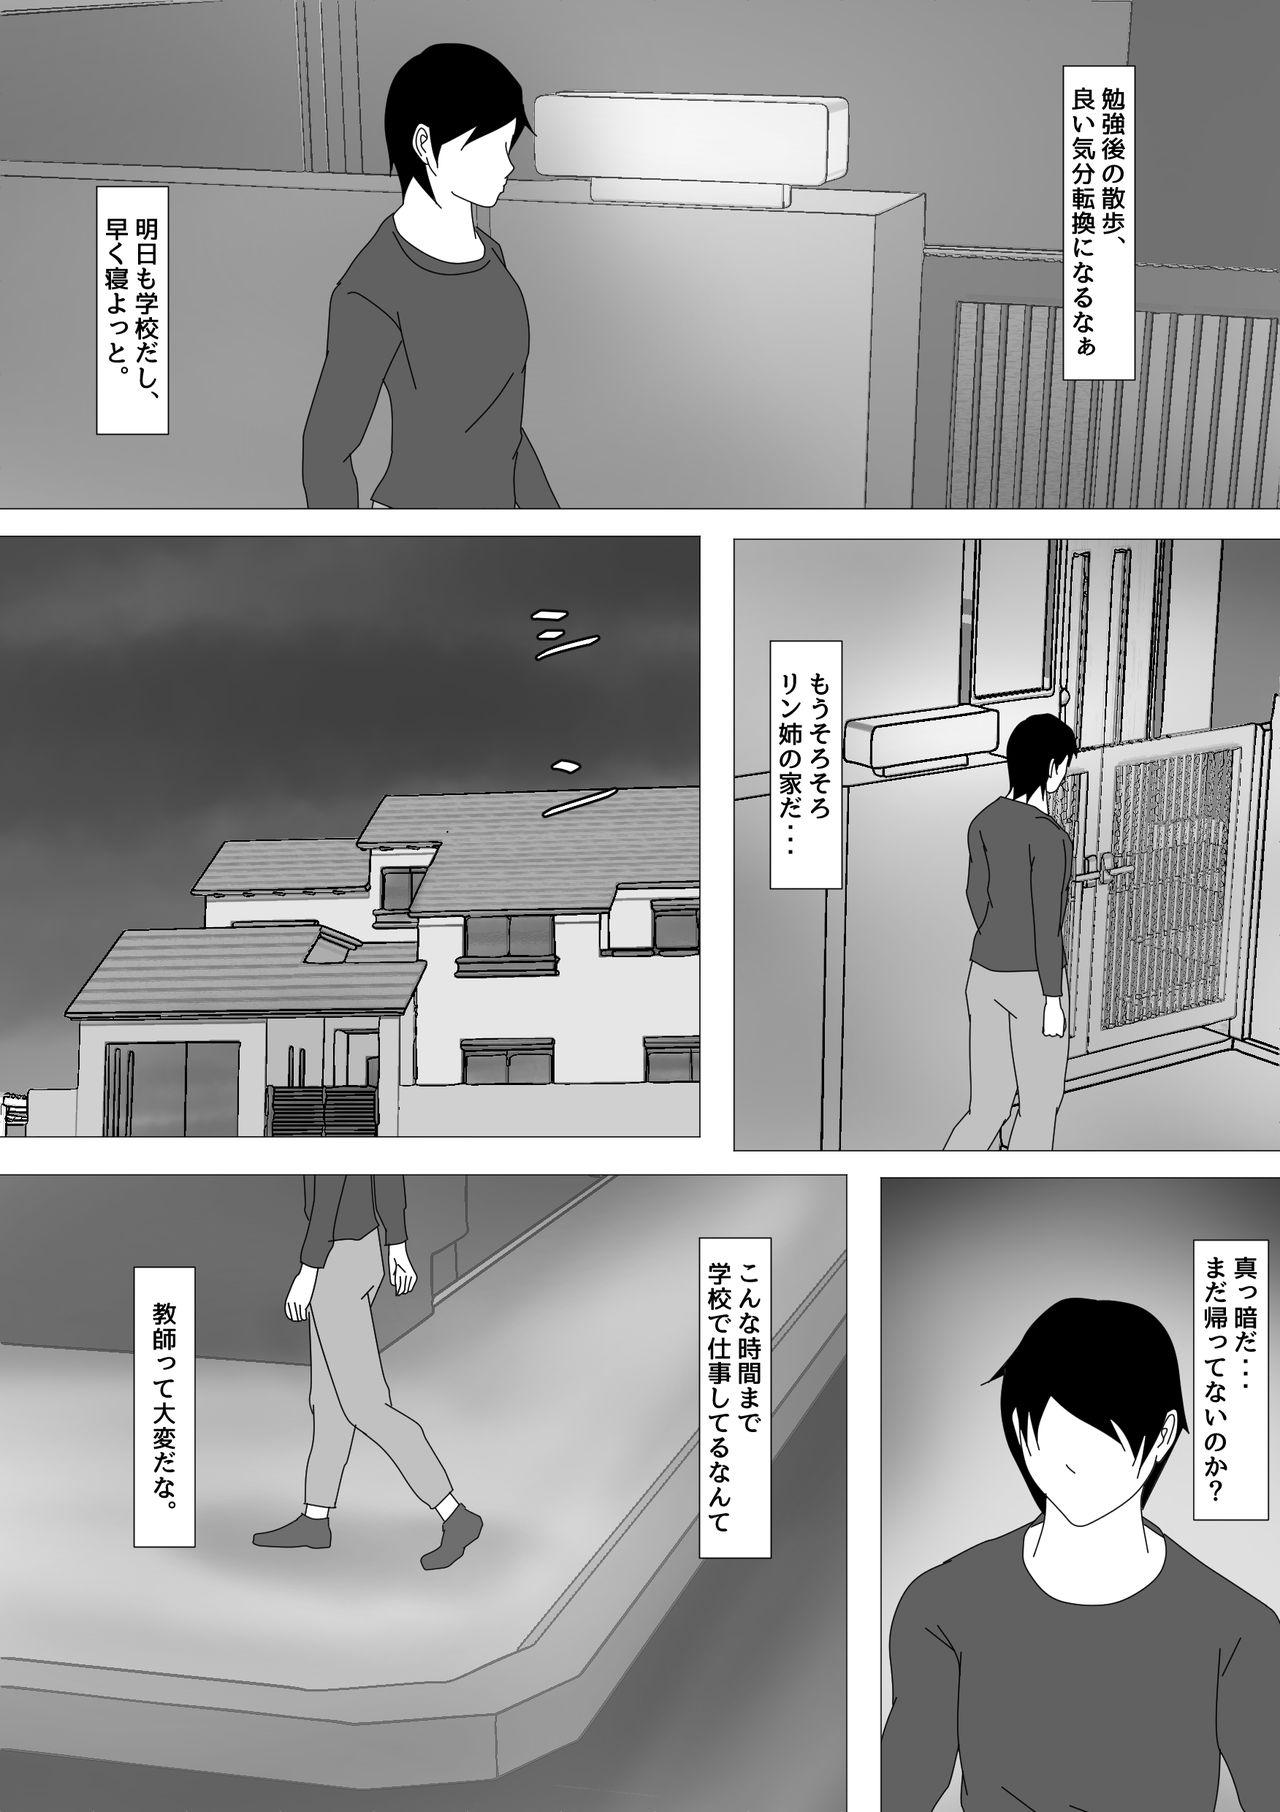 Jokyoushi Shinozaki Rin no Choukyou Kiroku Dai 2 | Female Teacher Rin Shinozaki's Training Record 2 12